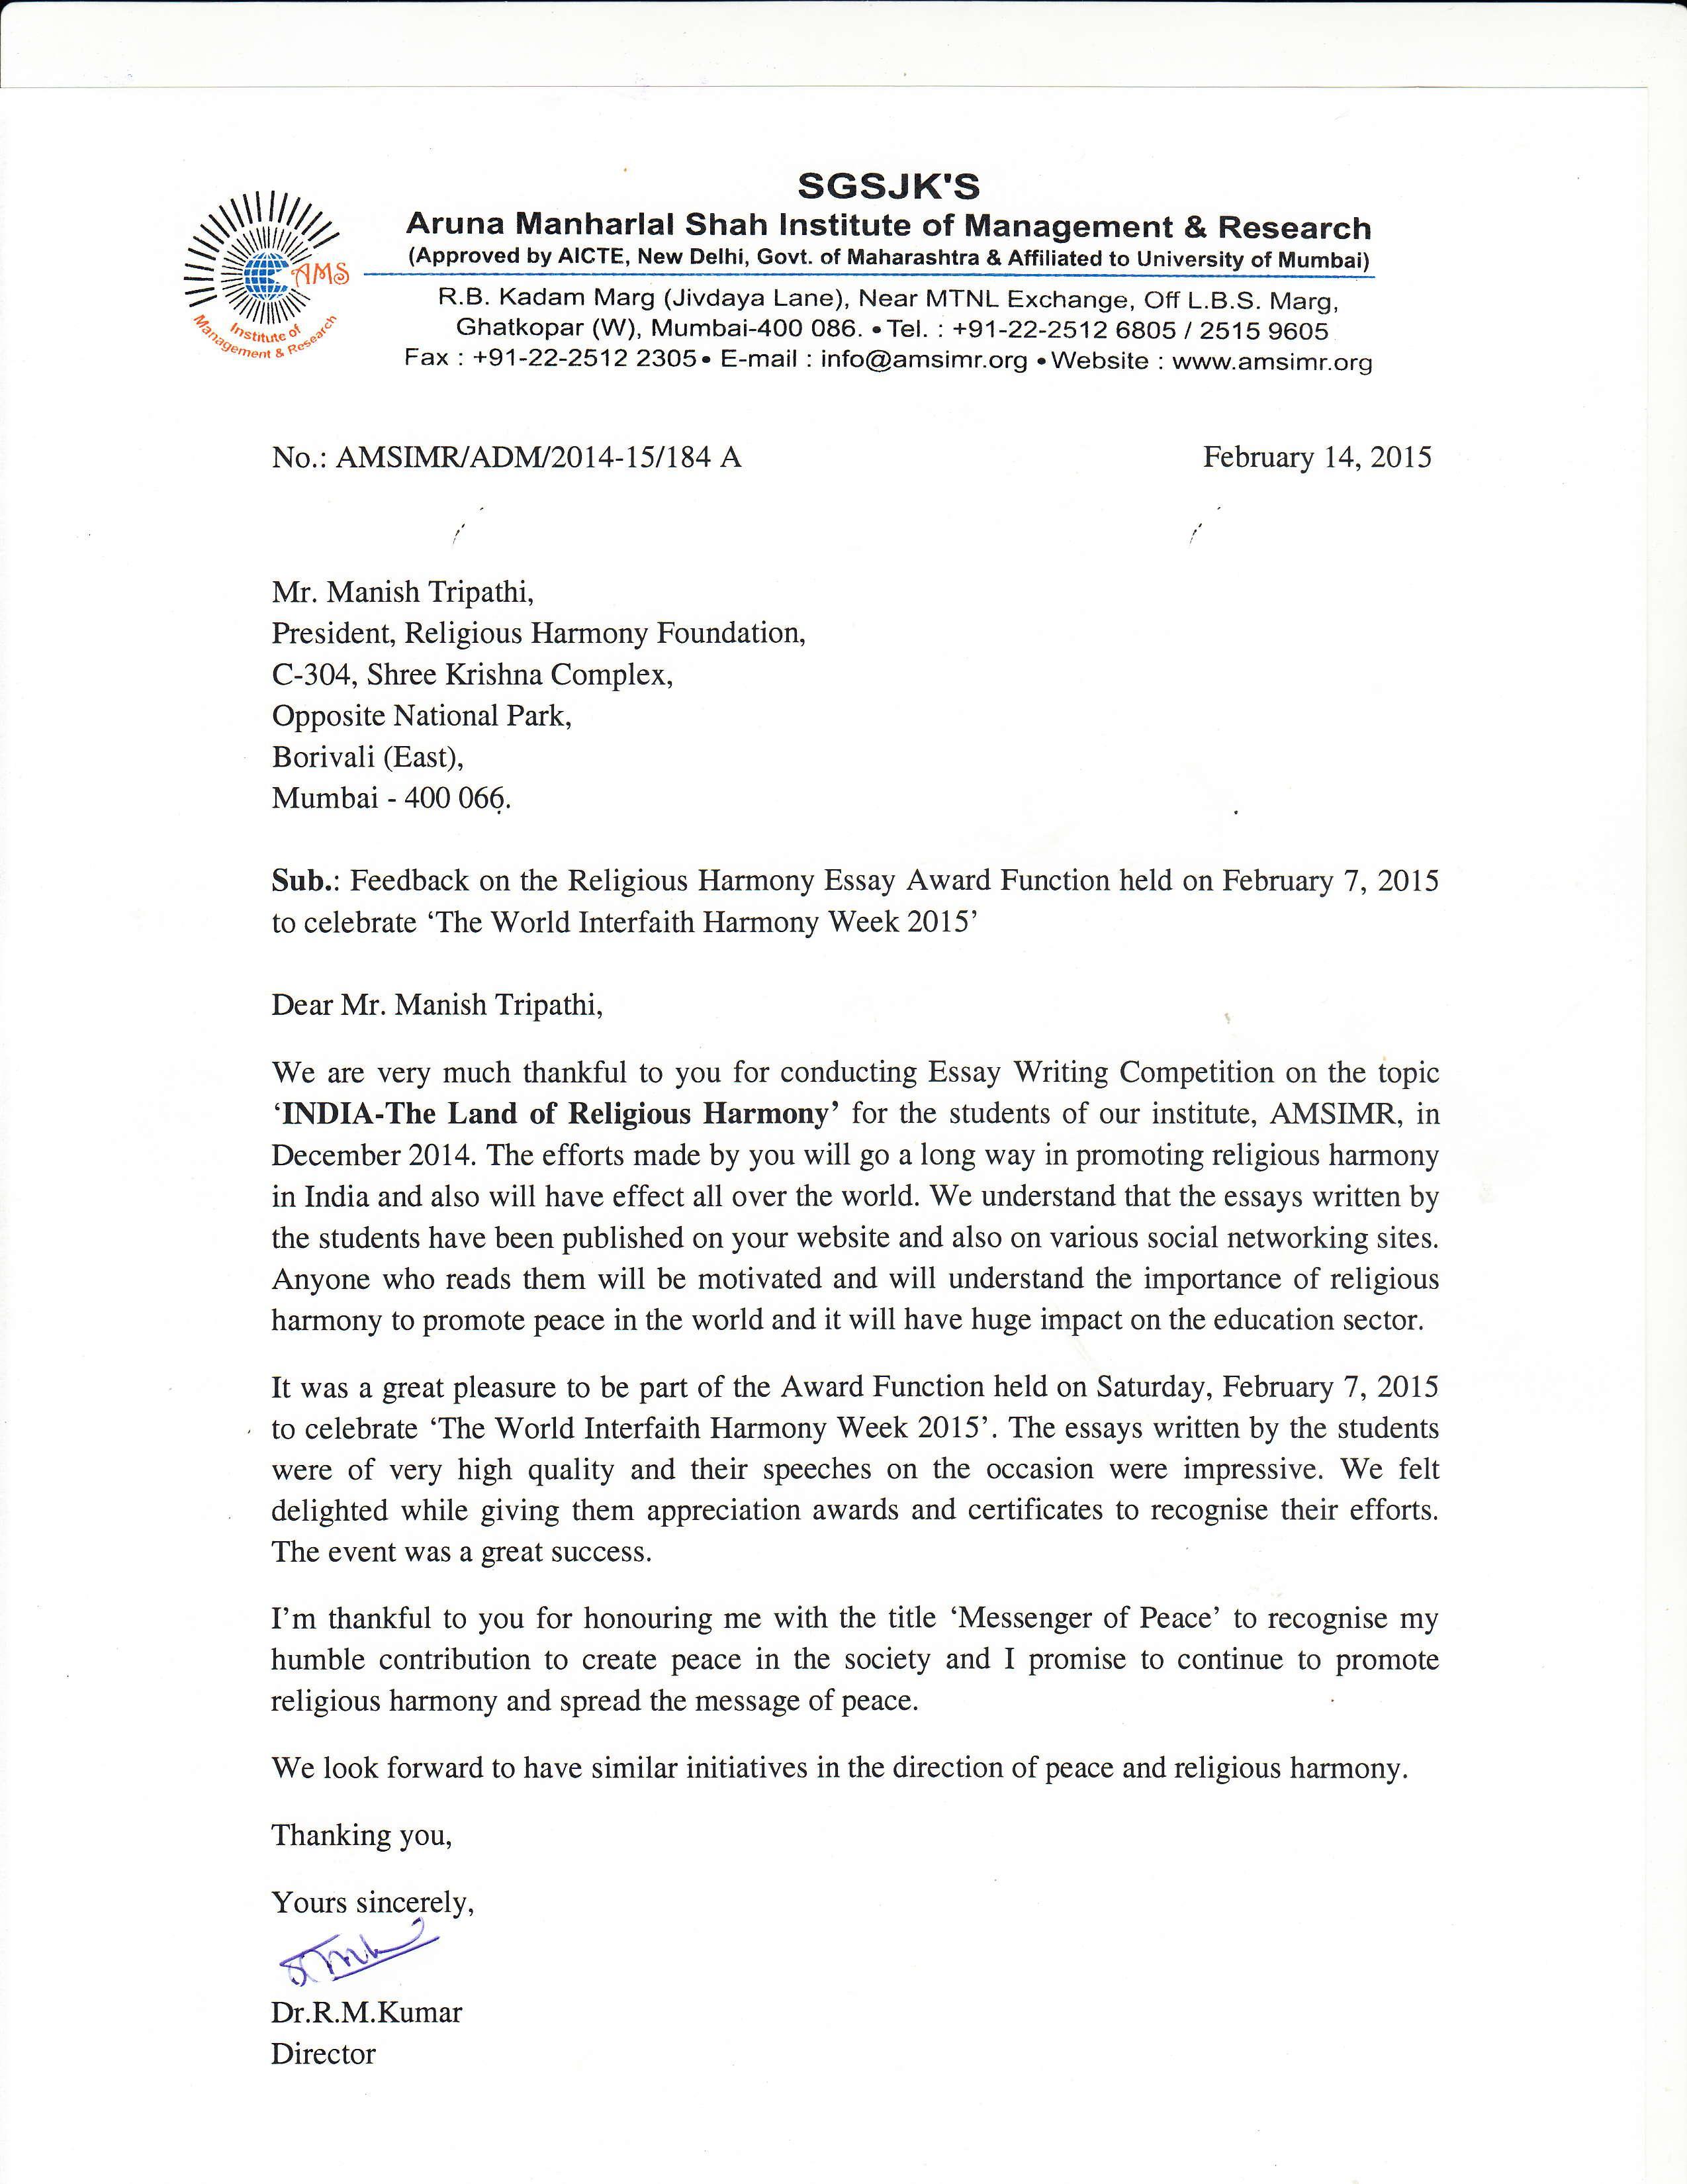 Feedback-Dr.-RM-Kumar-Religious-Harmony-Foundation-Mumbai.jpg